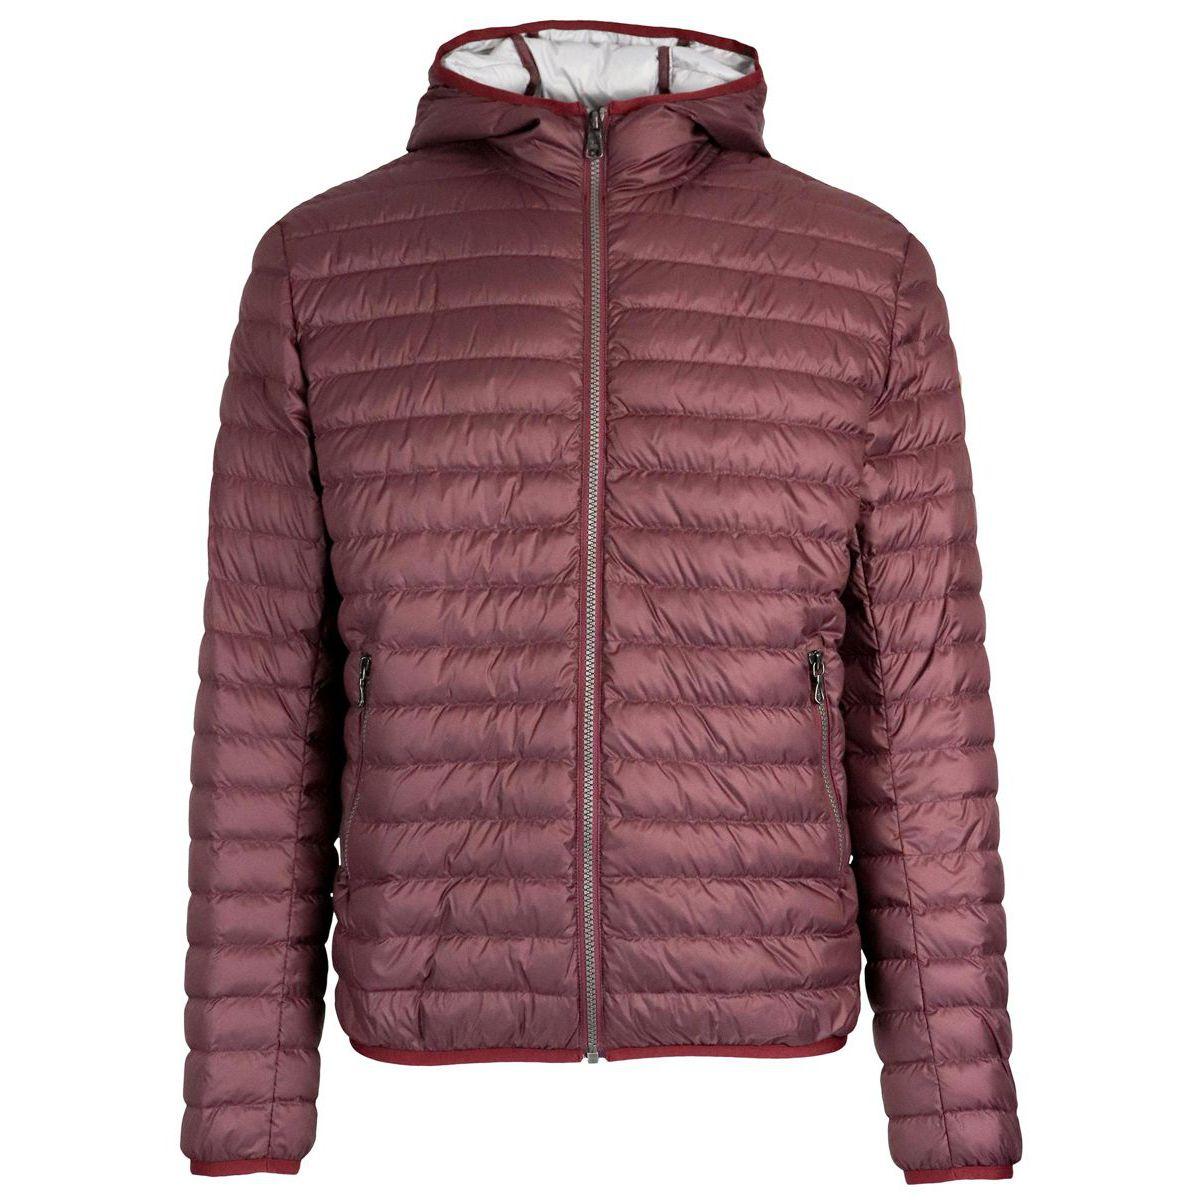 Down jacket 100 g 1277R 8RQ Bordeaux Colmar